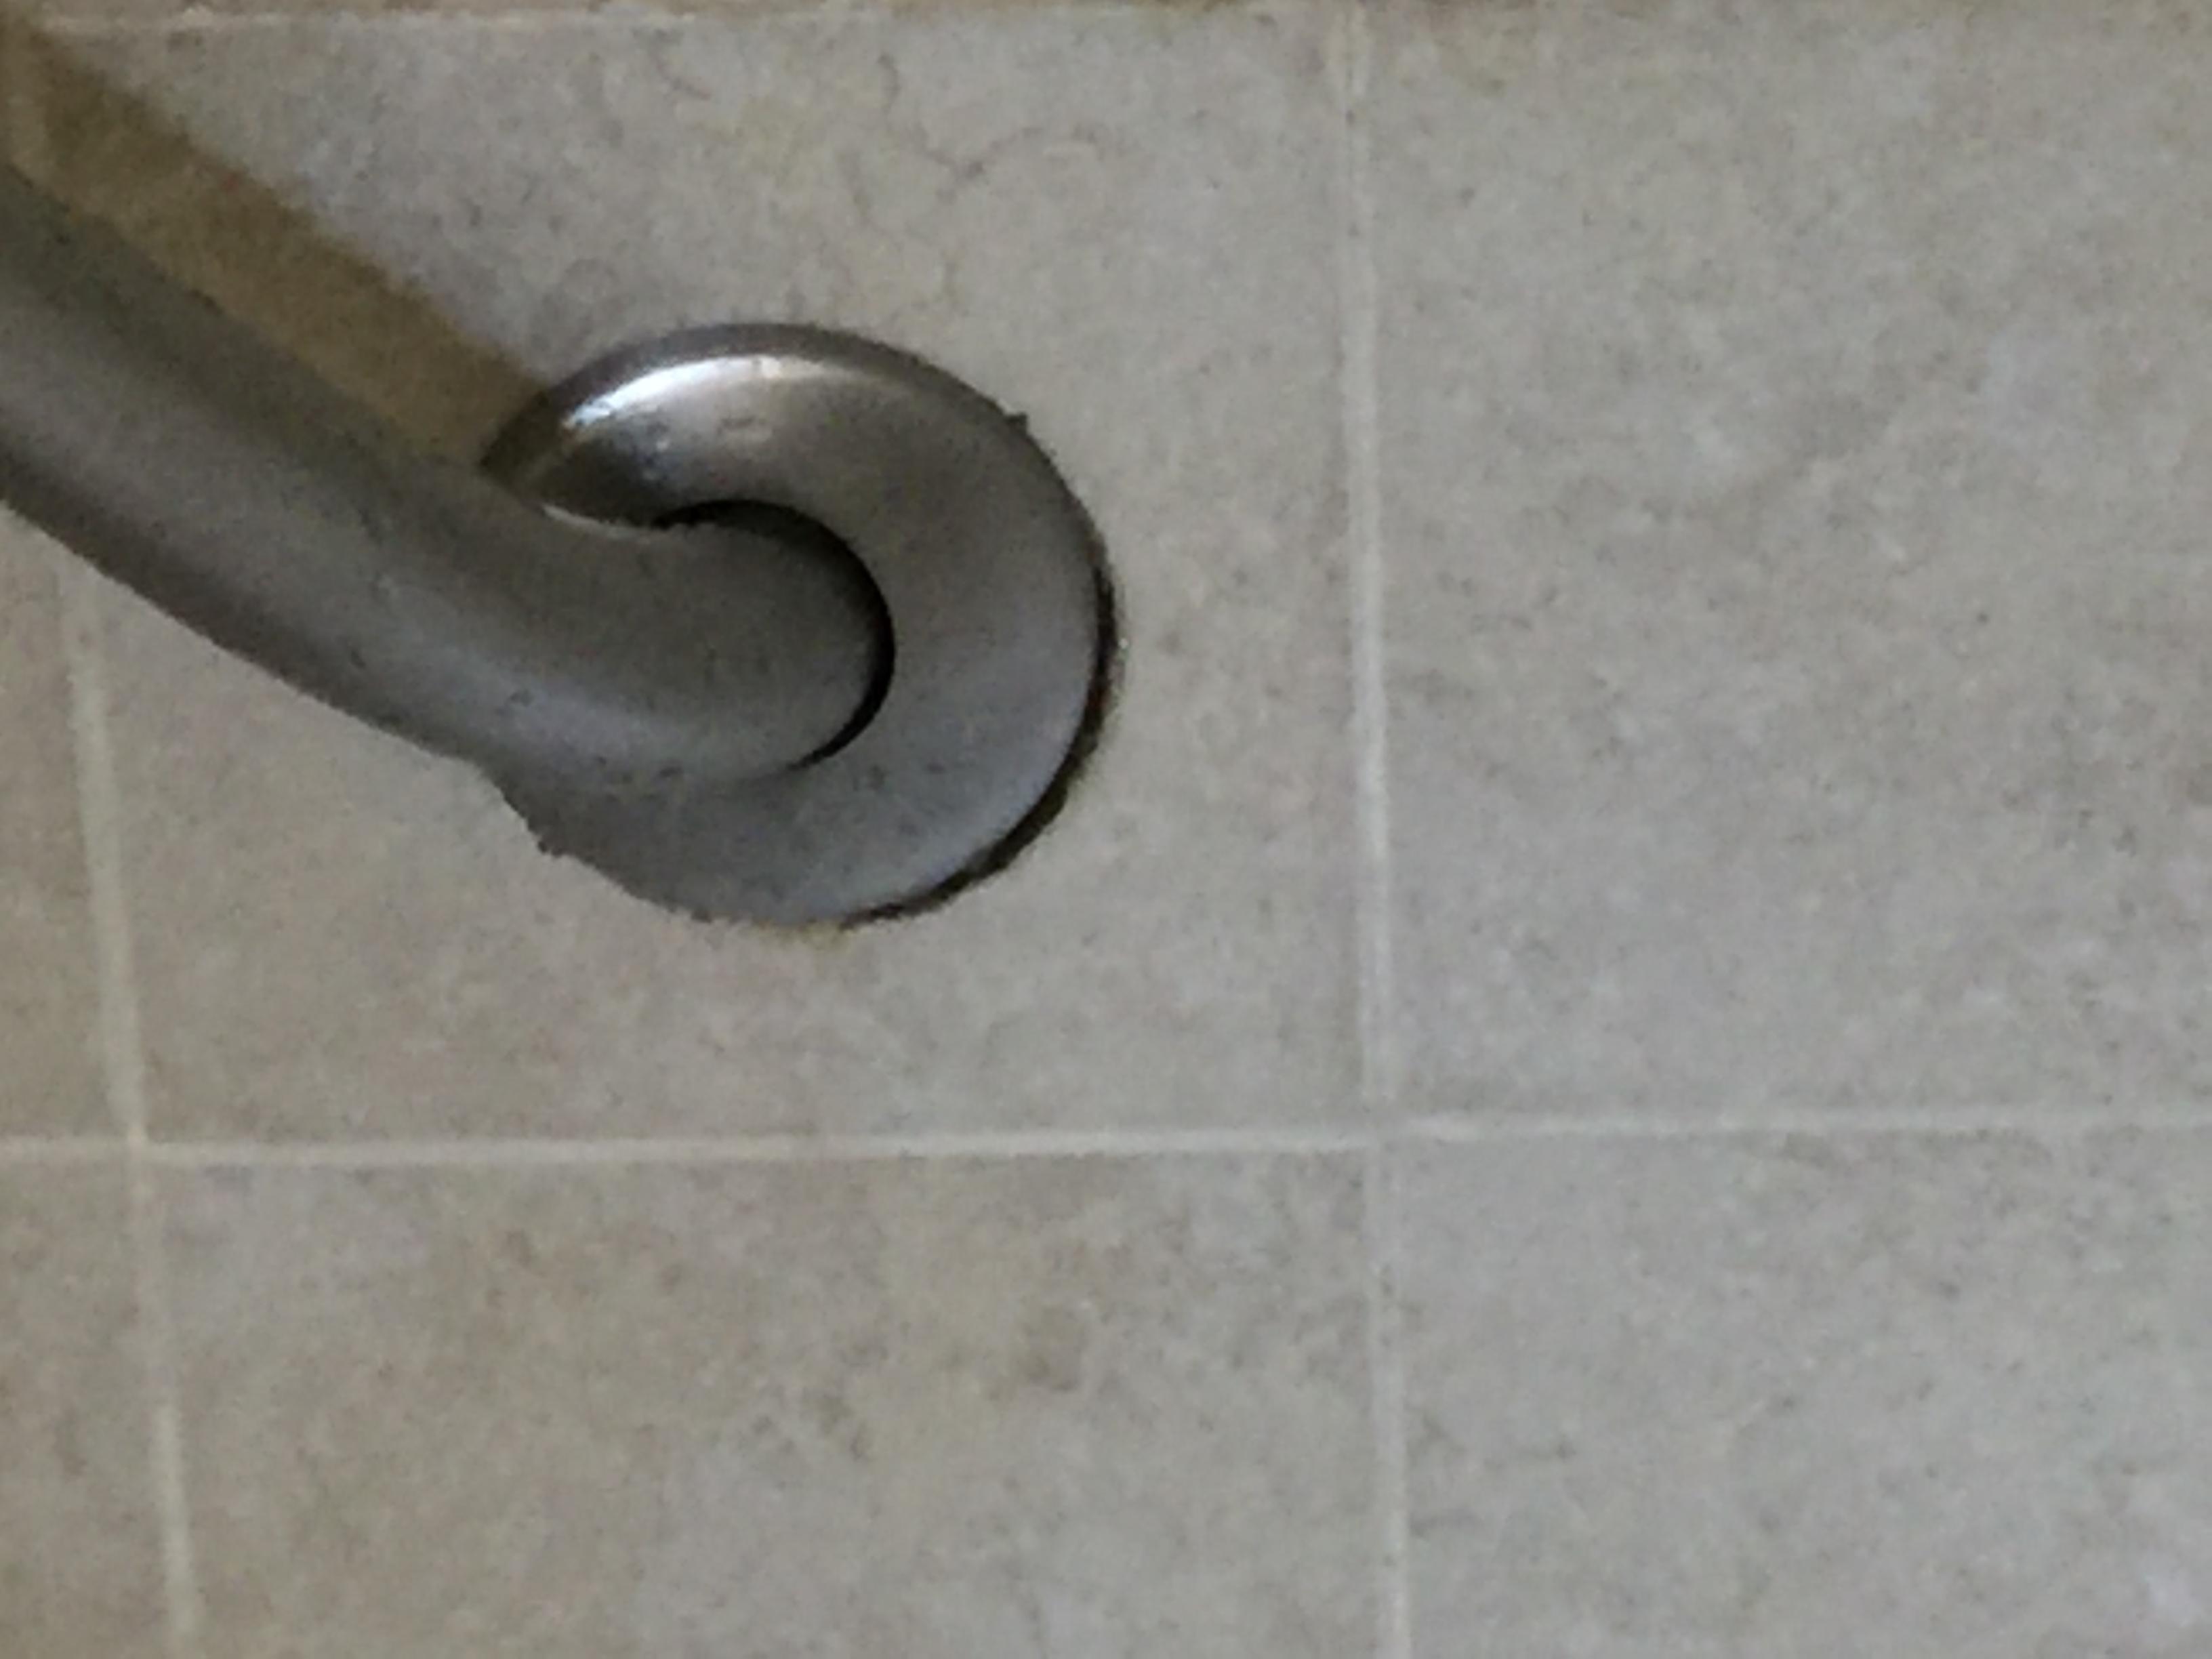 Bathroom mold in shower.